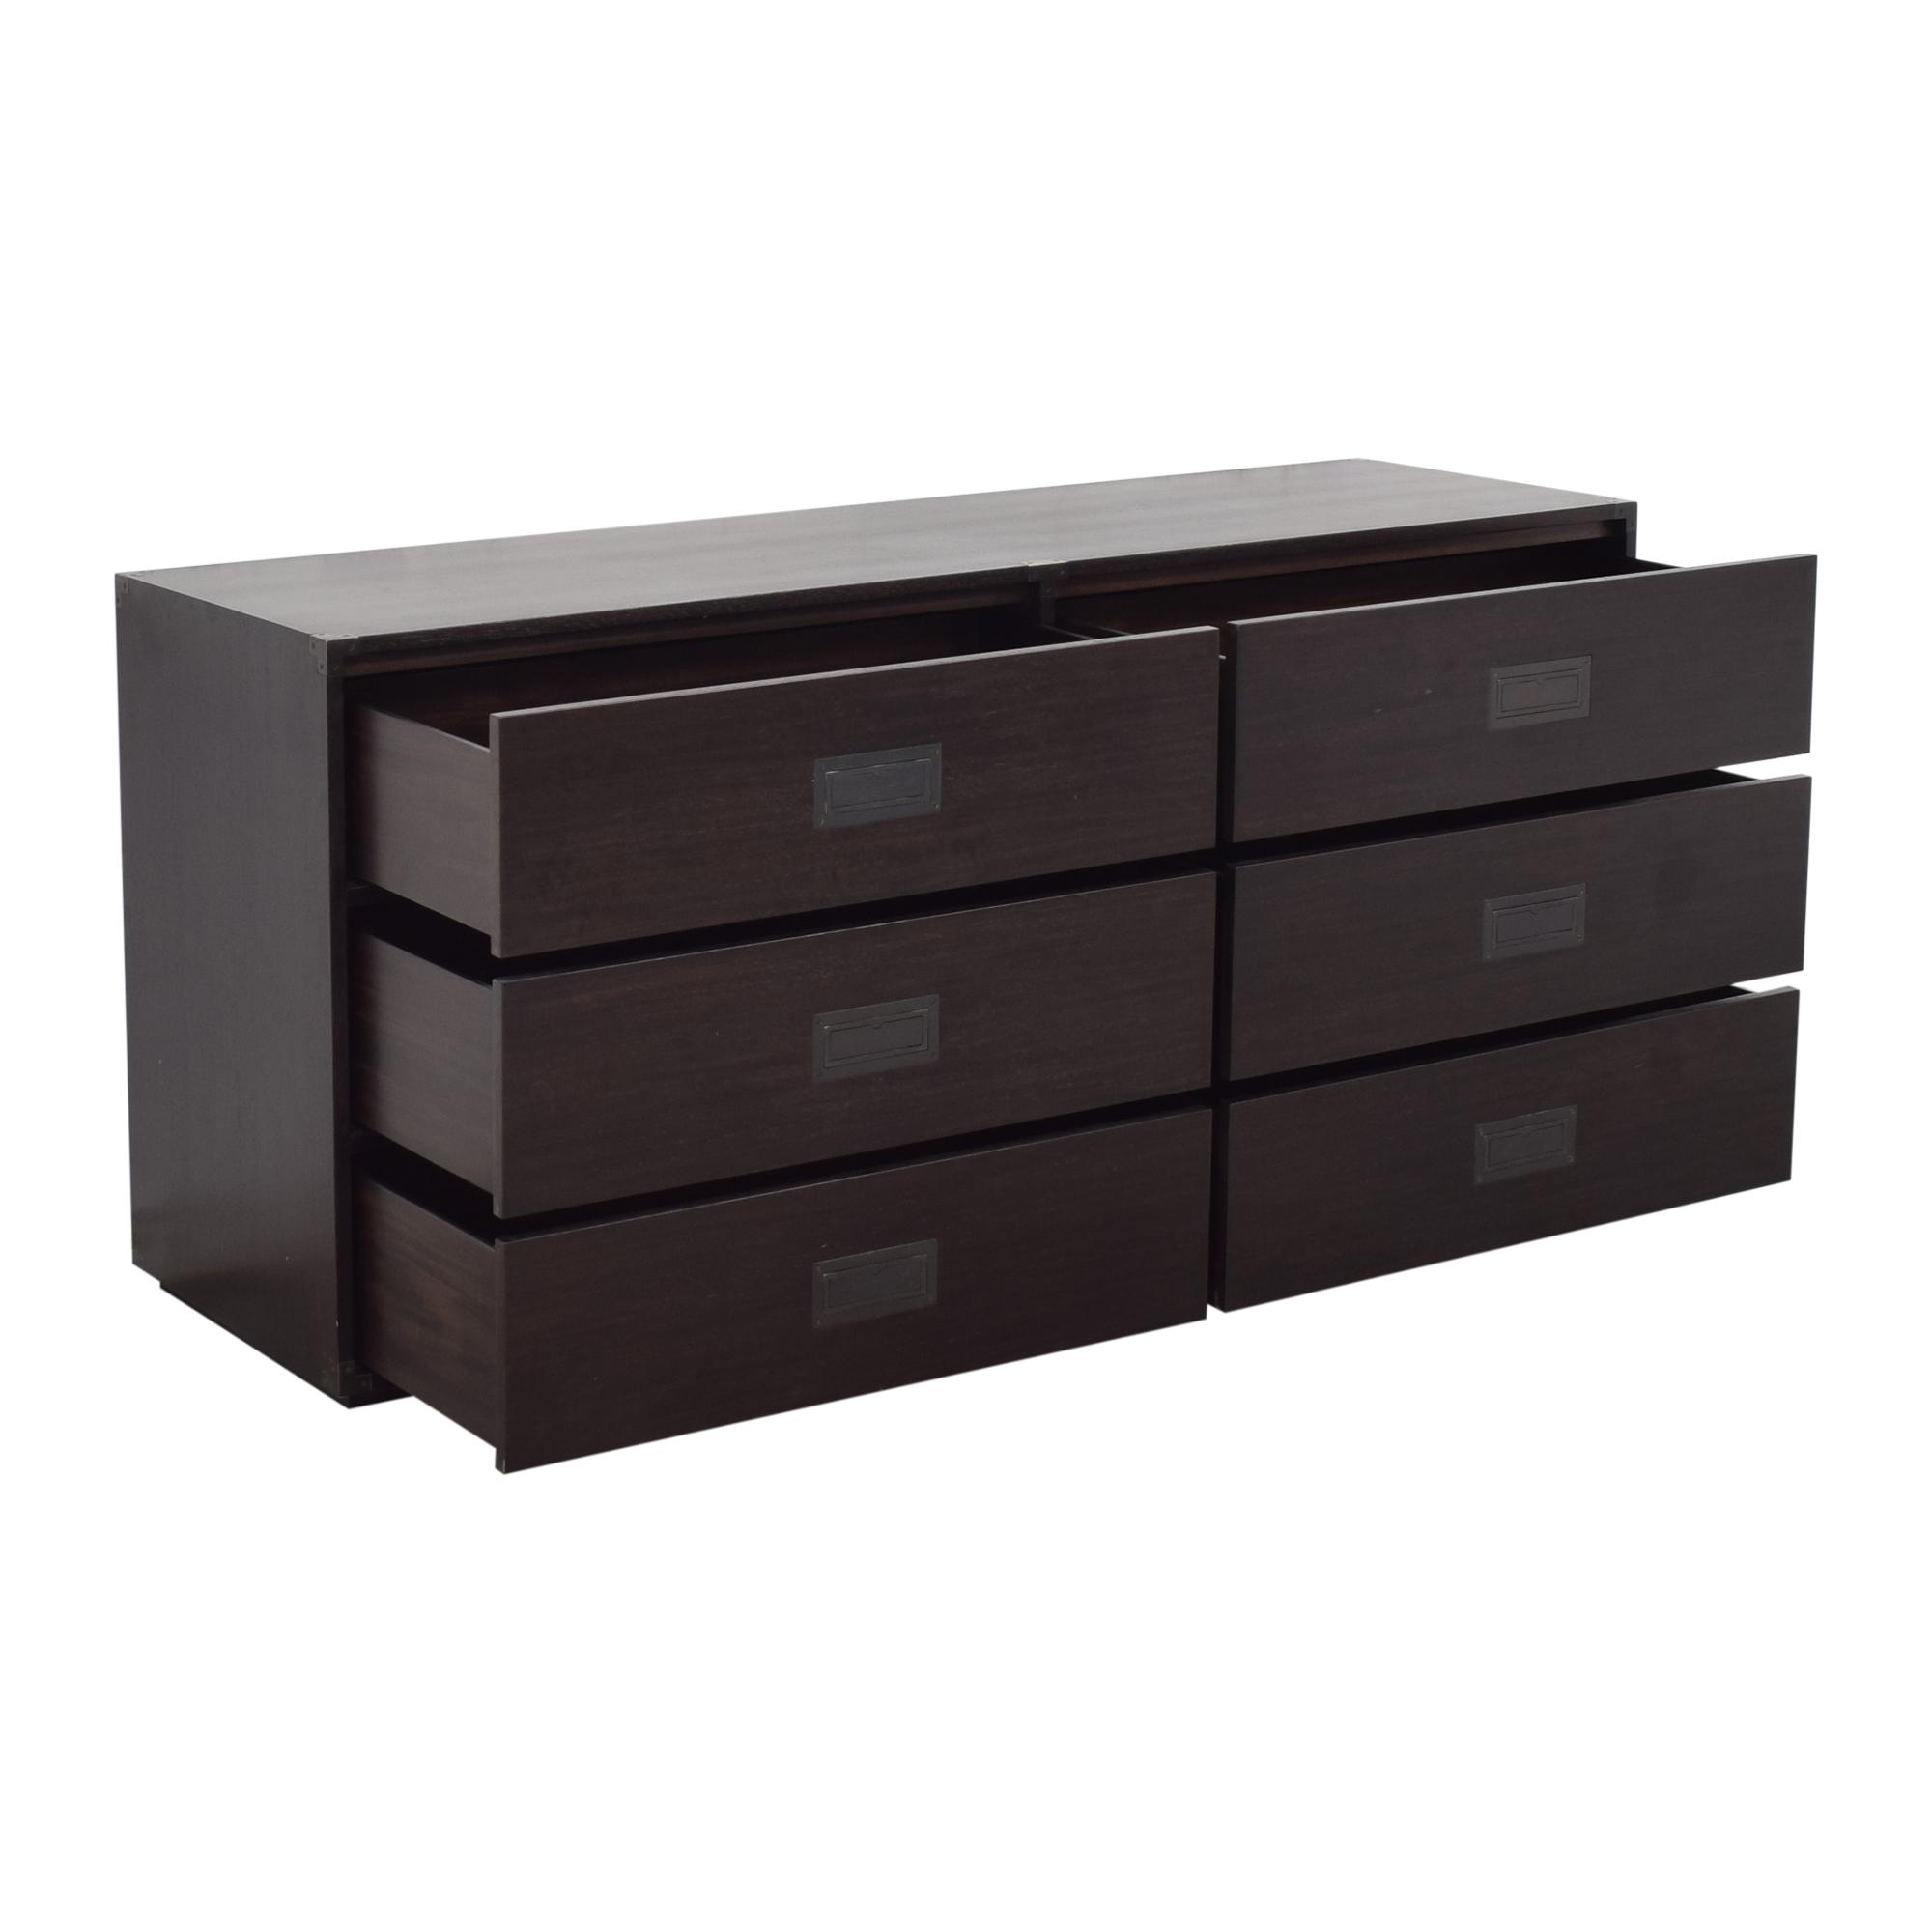 Restoration Hardware Restoration Hardware Six Drawer Double Dresser on sale